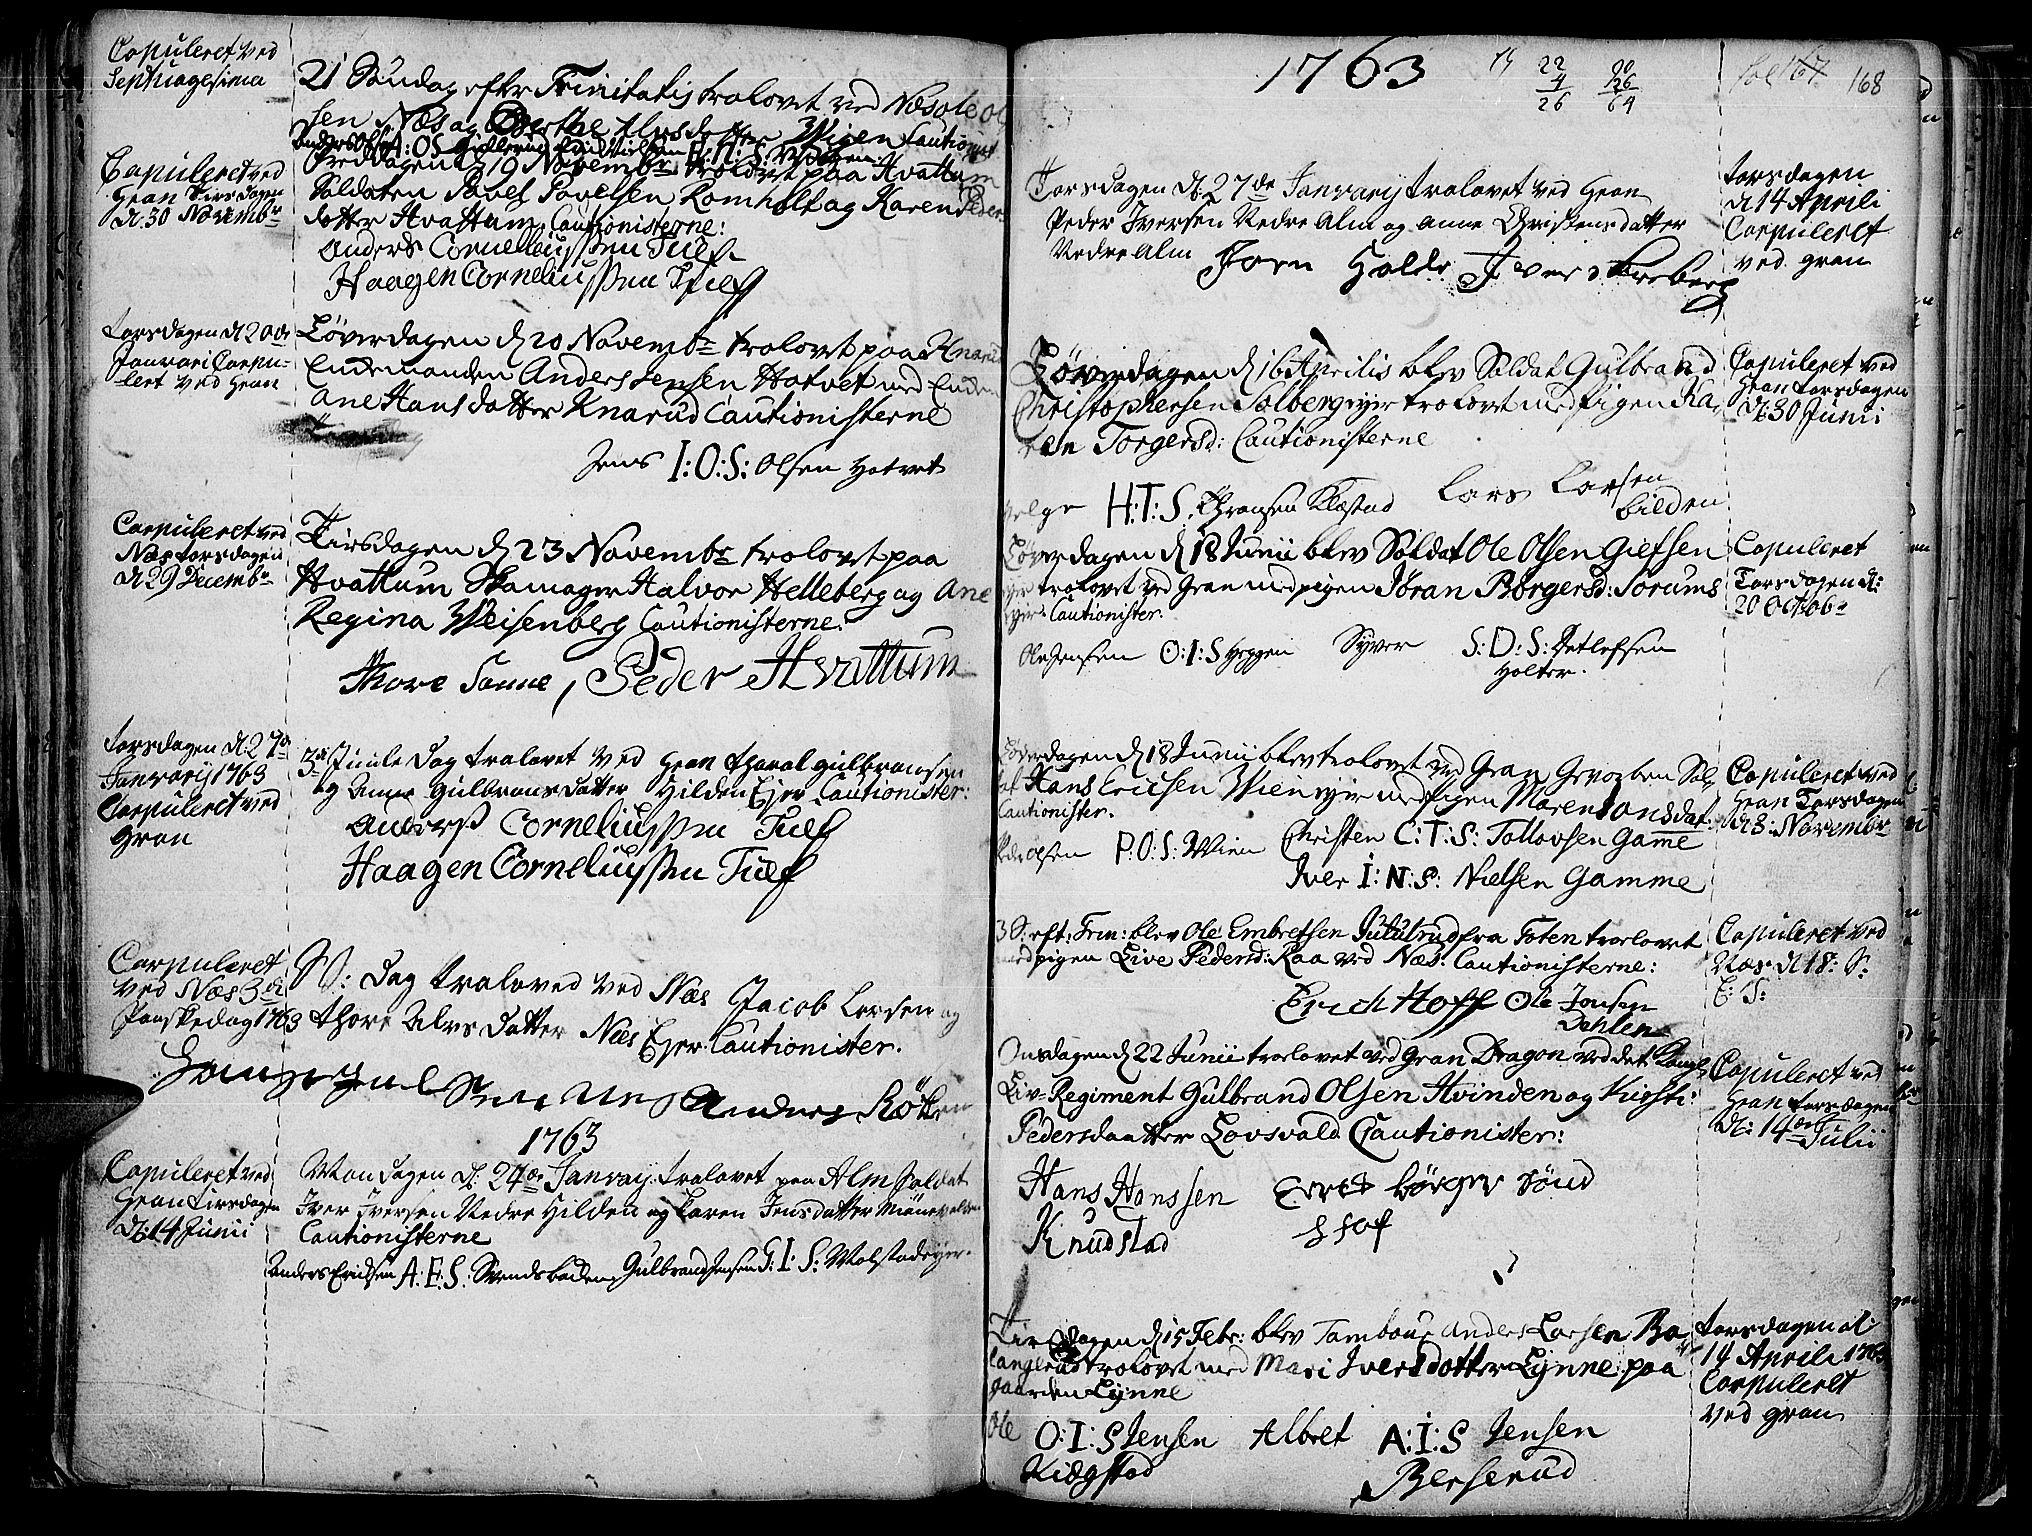 SAH, Gran prestekontor, Ministerialbok nr. 4, 1759-1775, s. 168